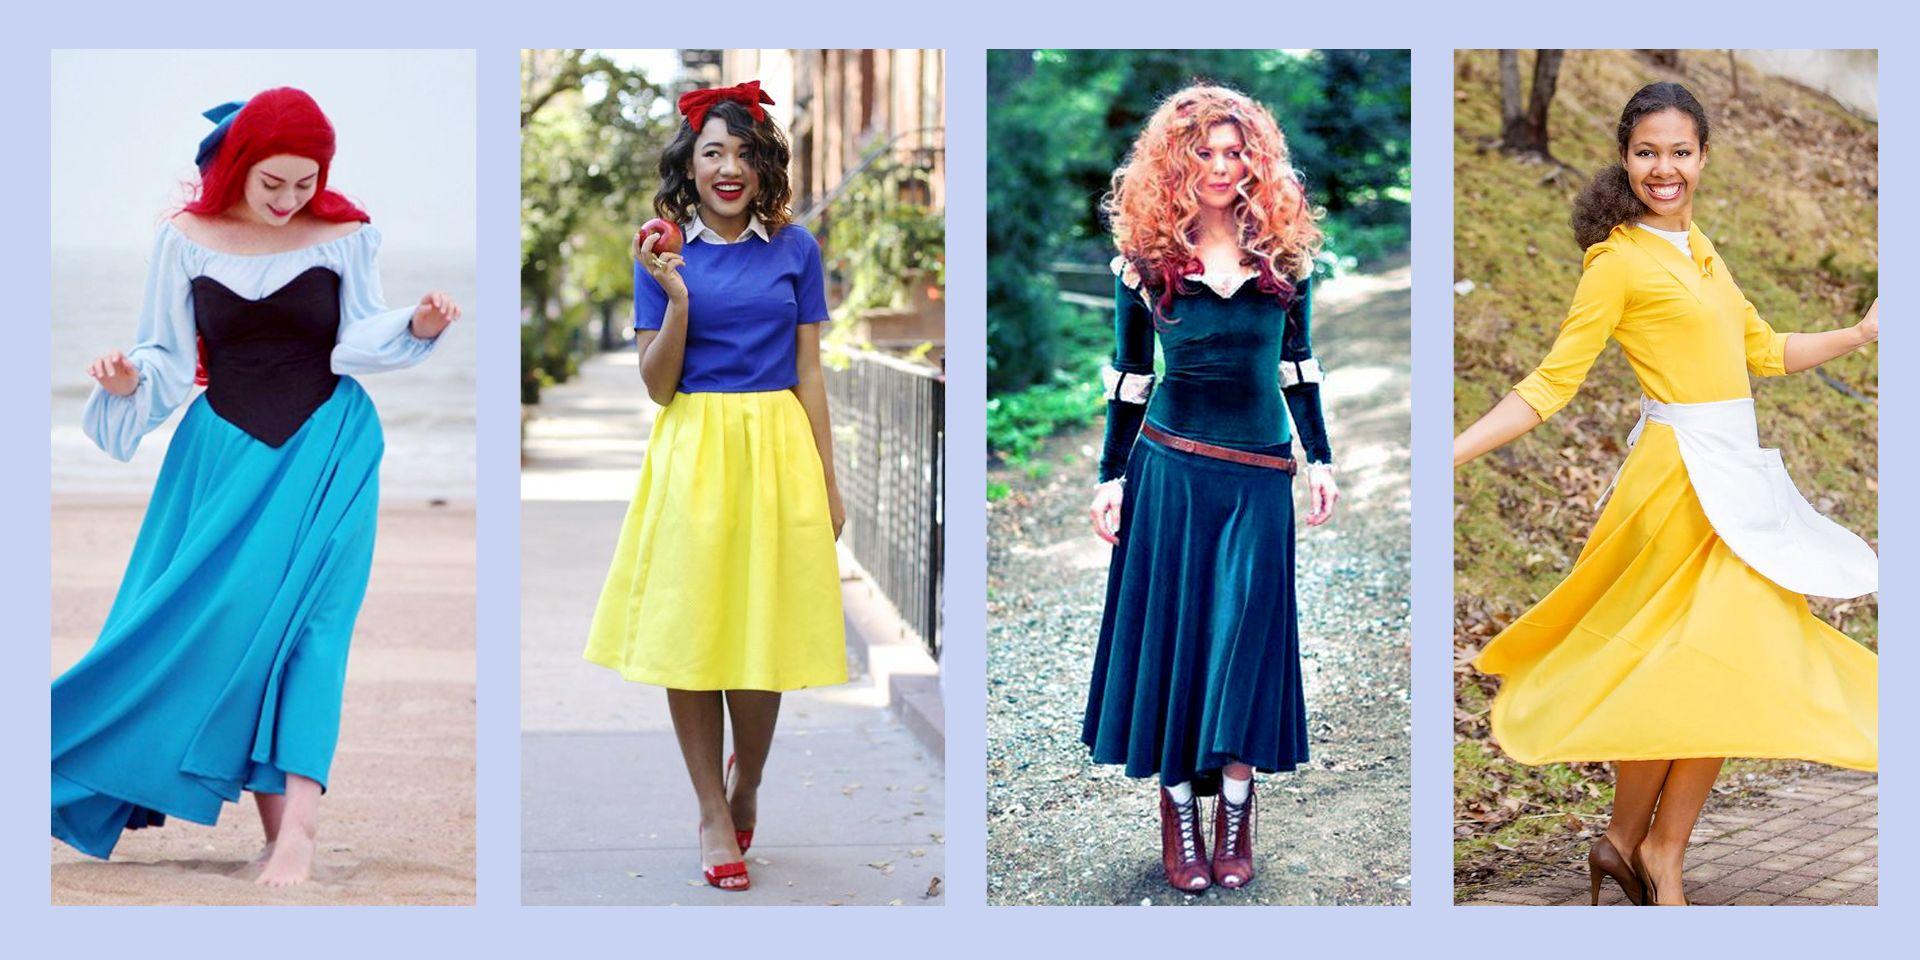 18 DIY Disney Princess Costumes That Will Make You Feel Like Princess Ariel IRL